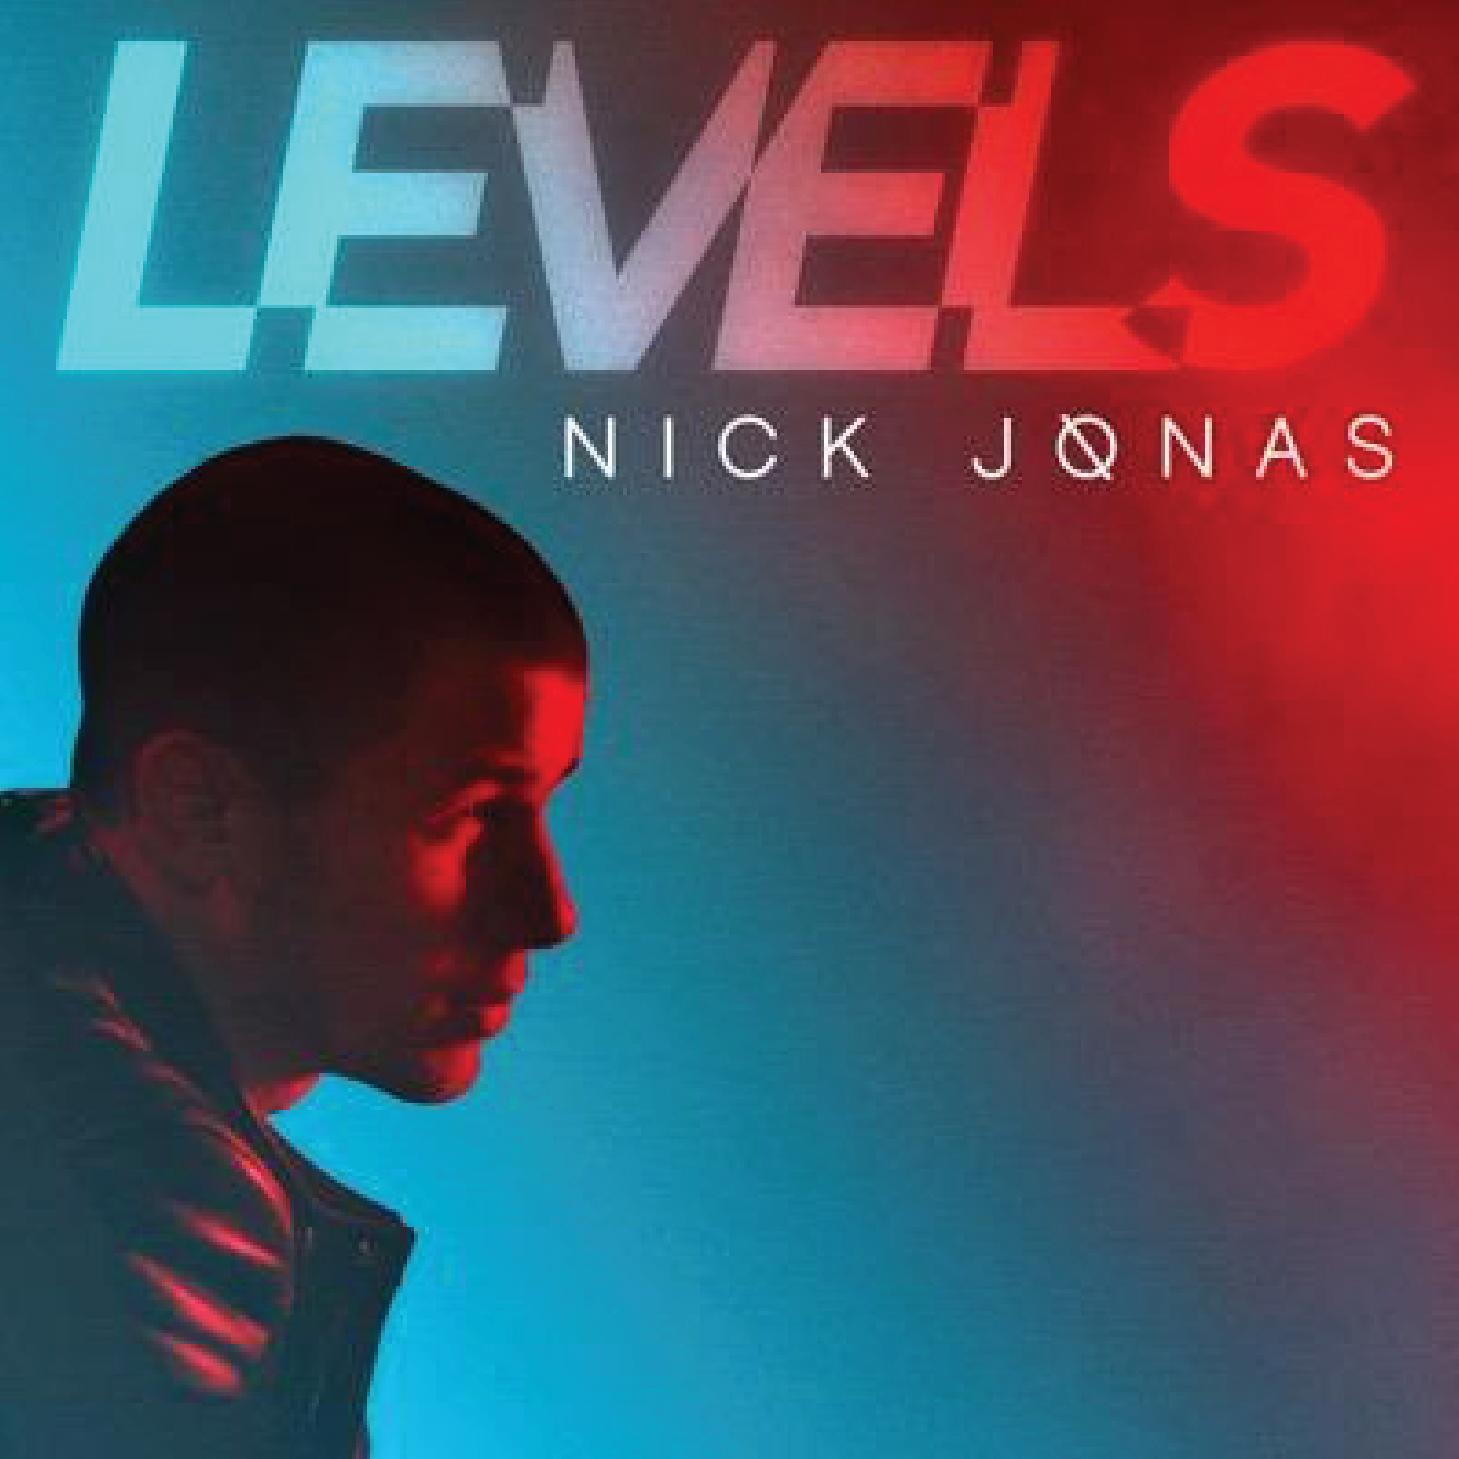 Music Thumbnails 1916_2_Nick Jonas - Levels.png